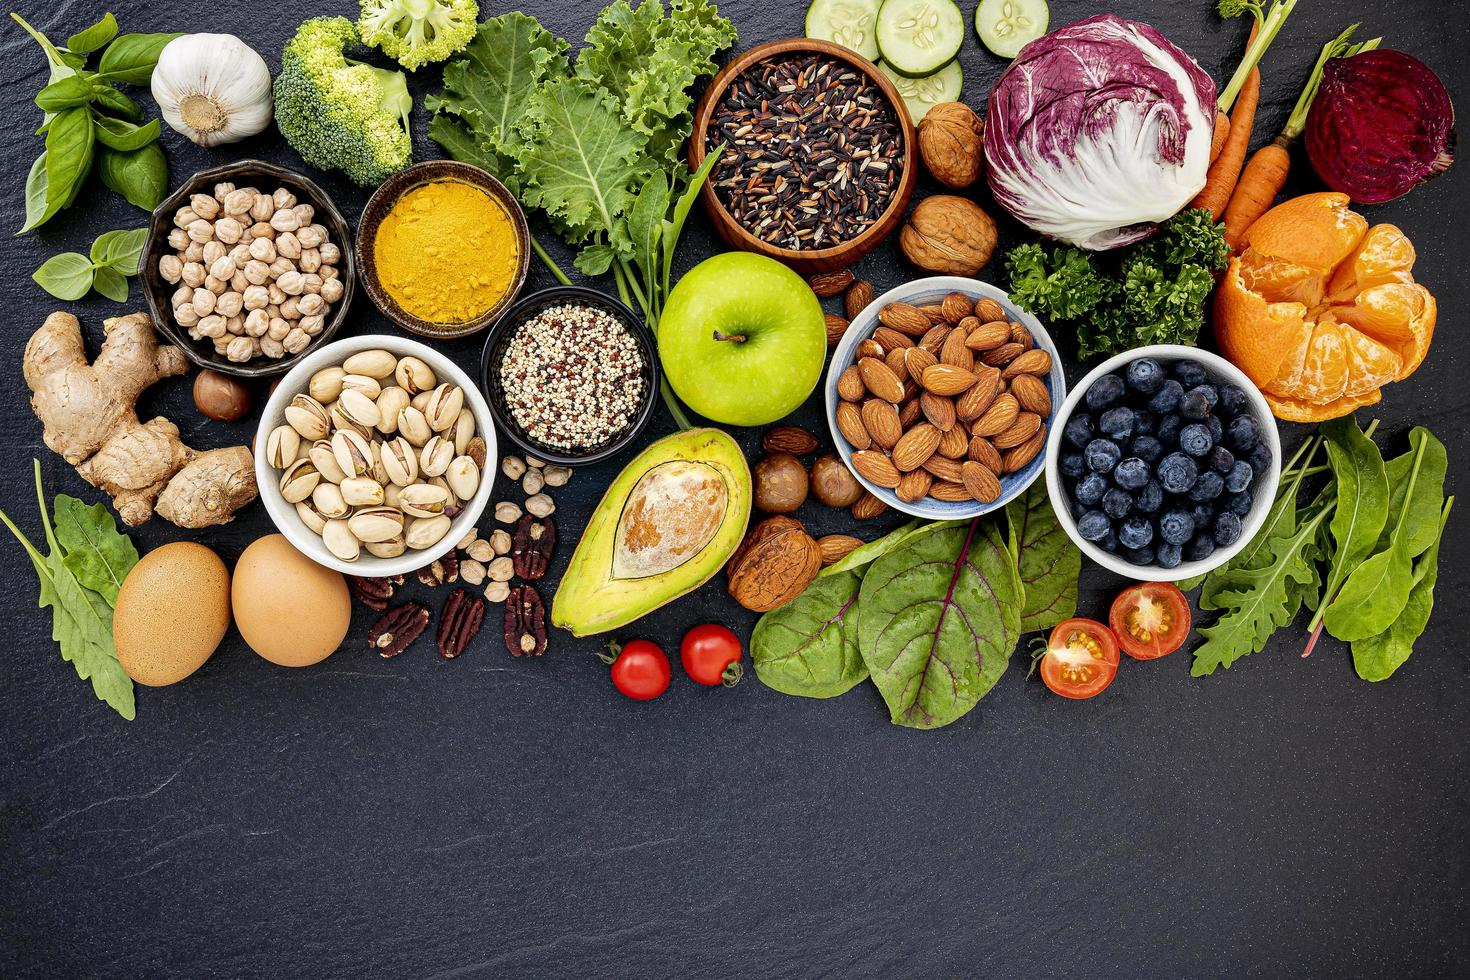 Healthy food selection photo